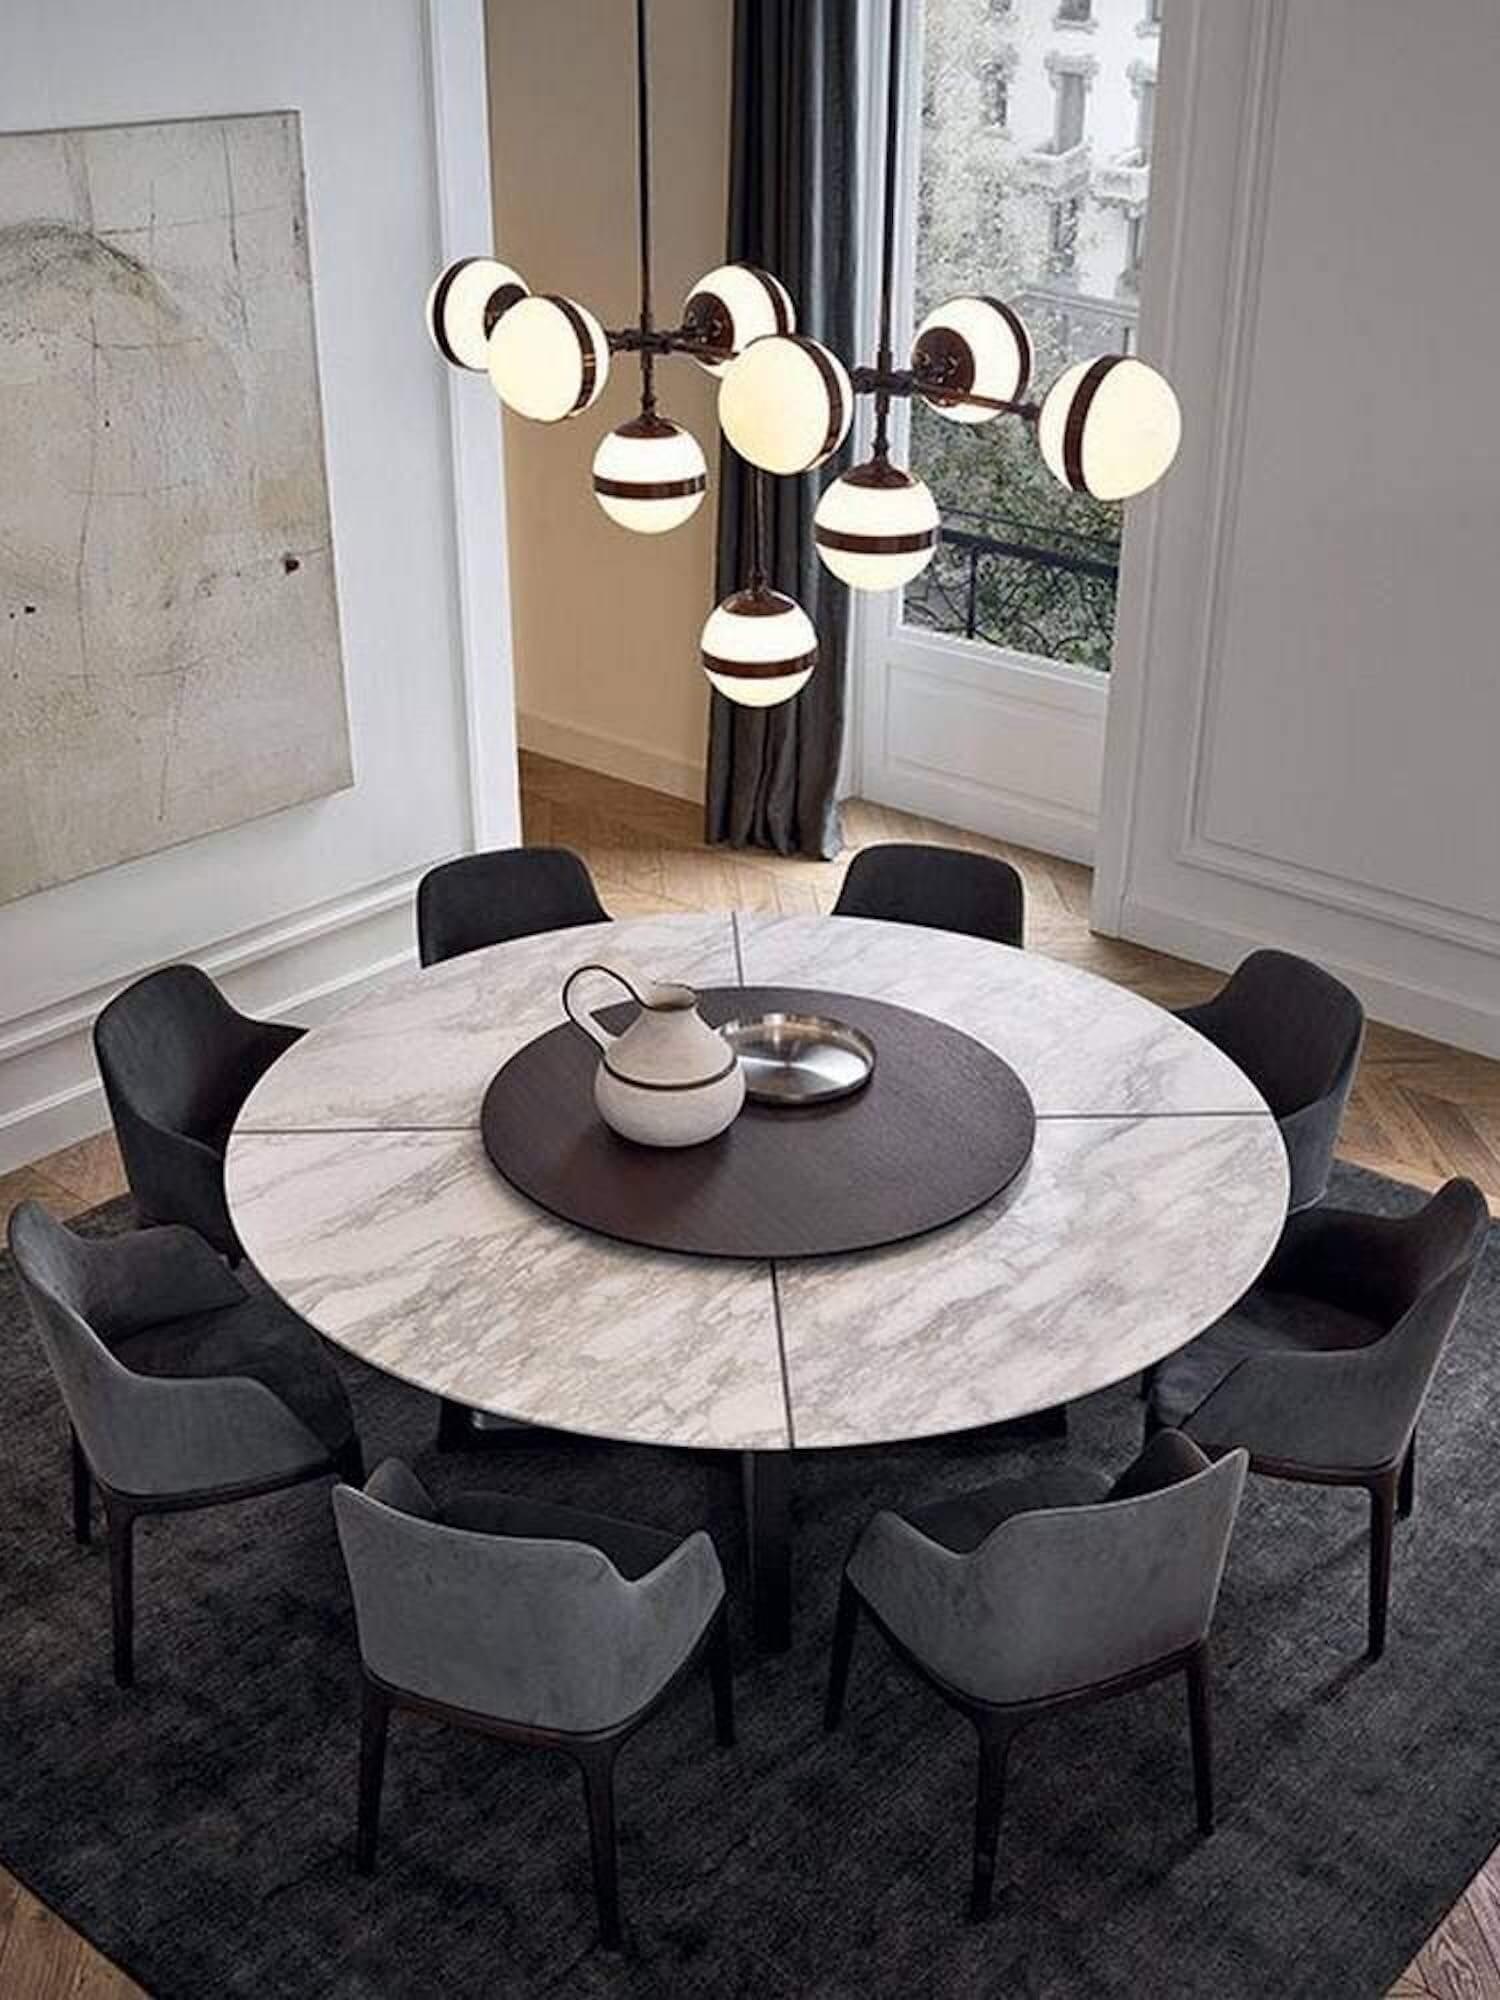 est living poliform dining concorde table grace chairs 2